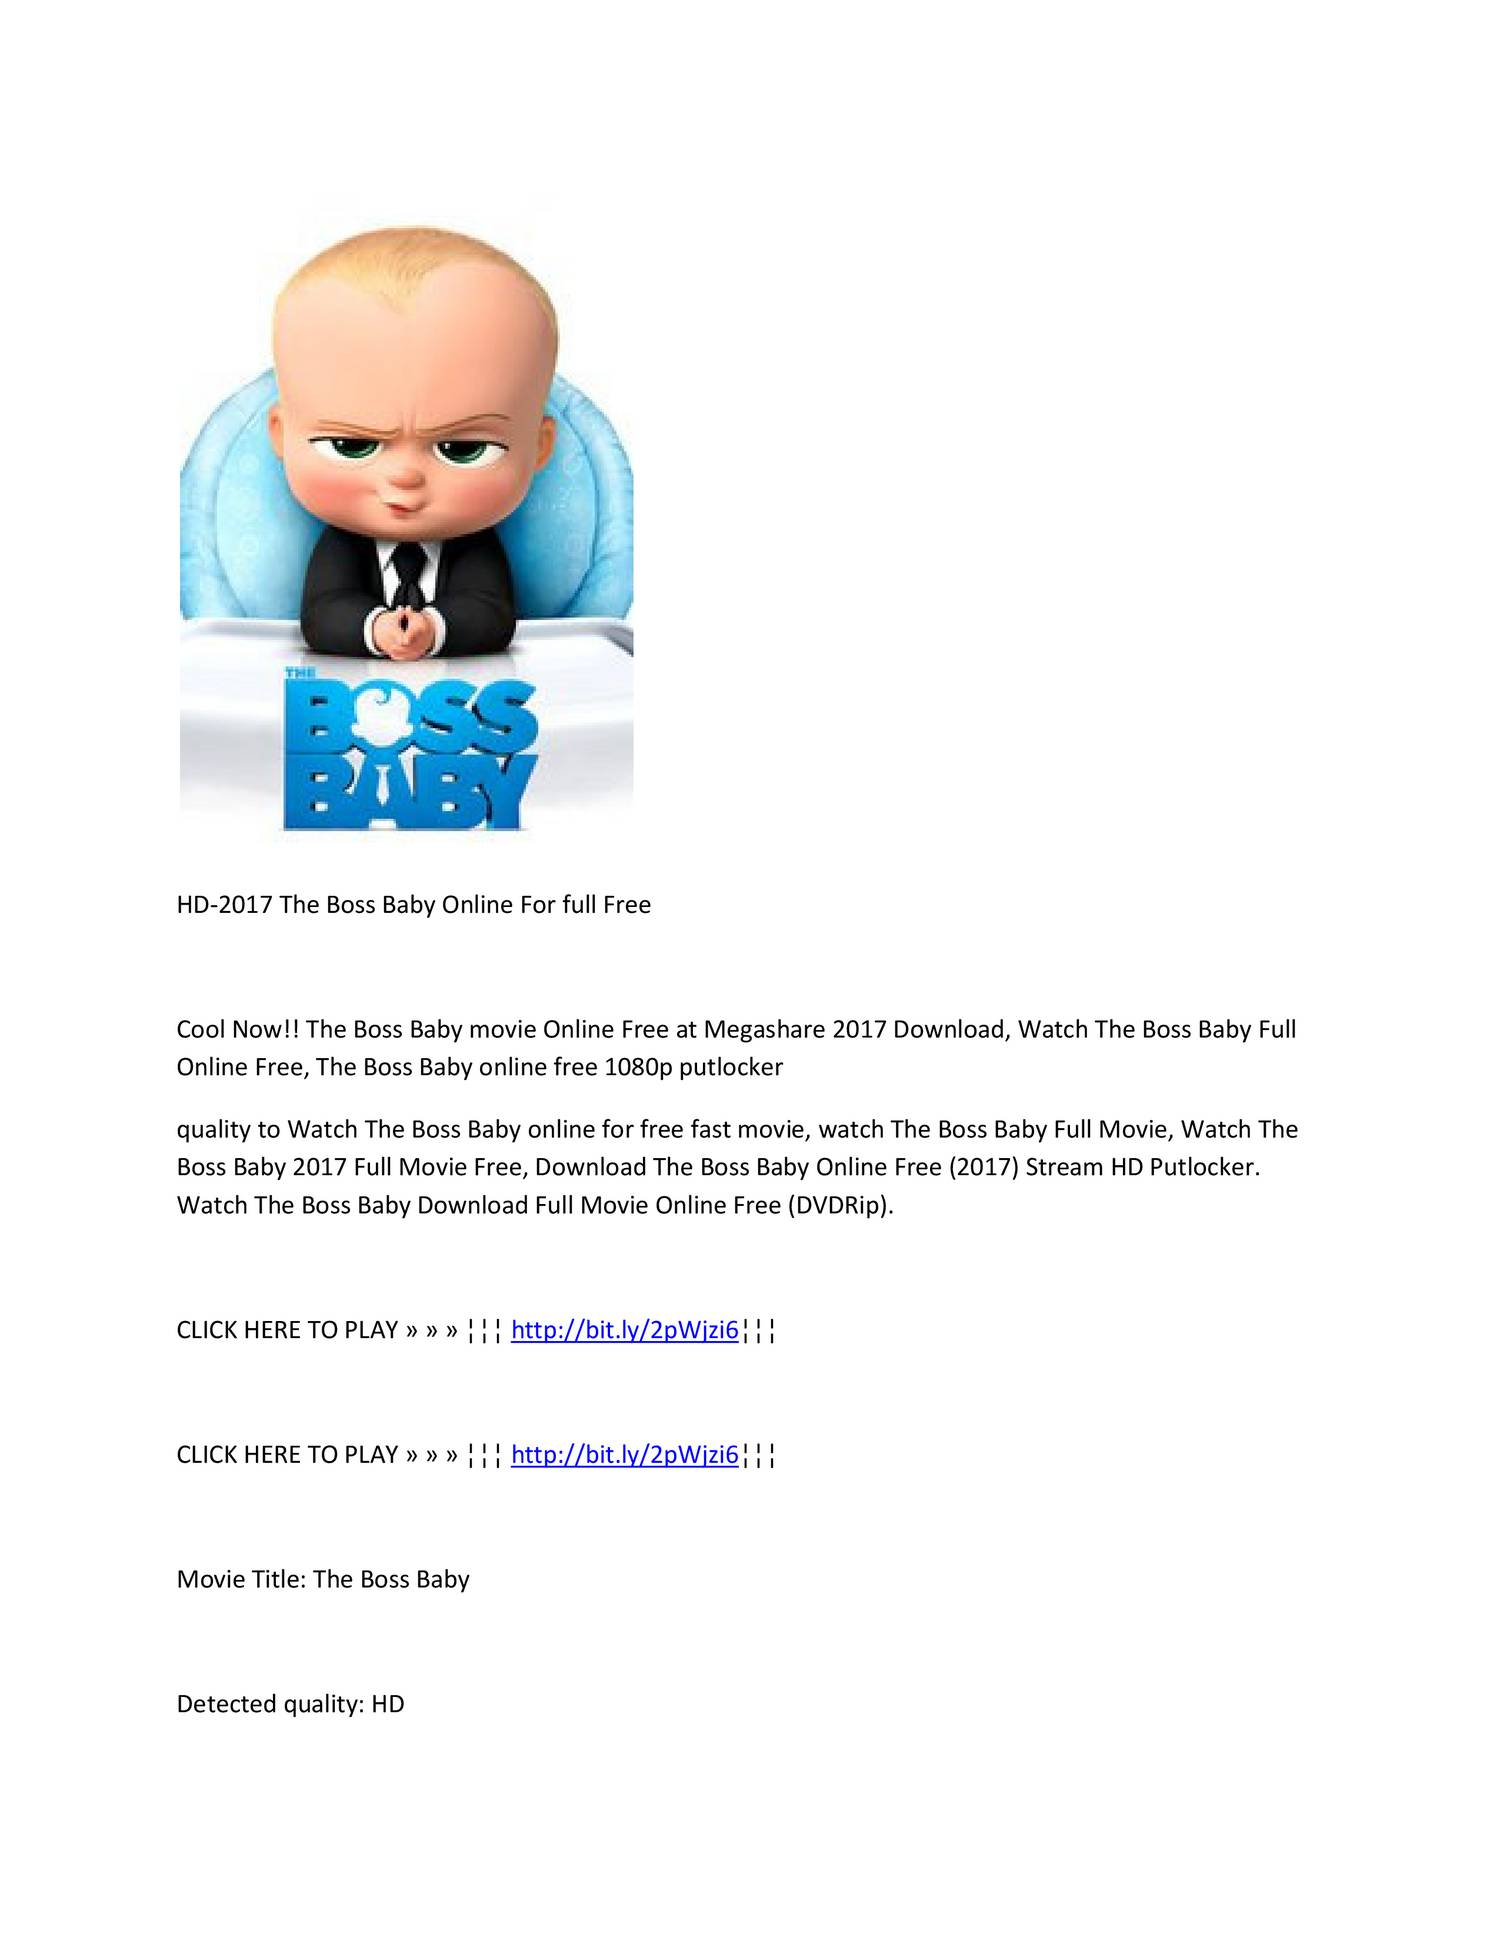 boss baby full movie watch online free hd